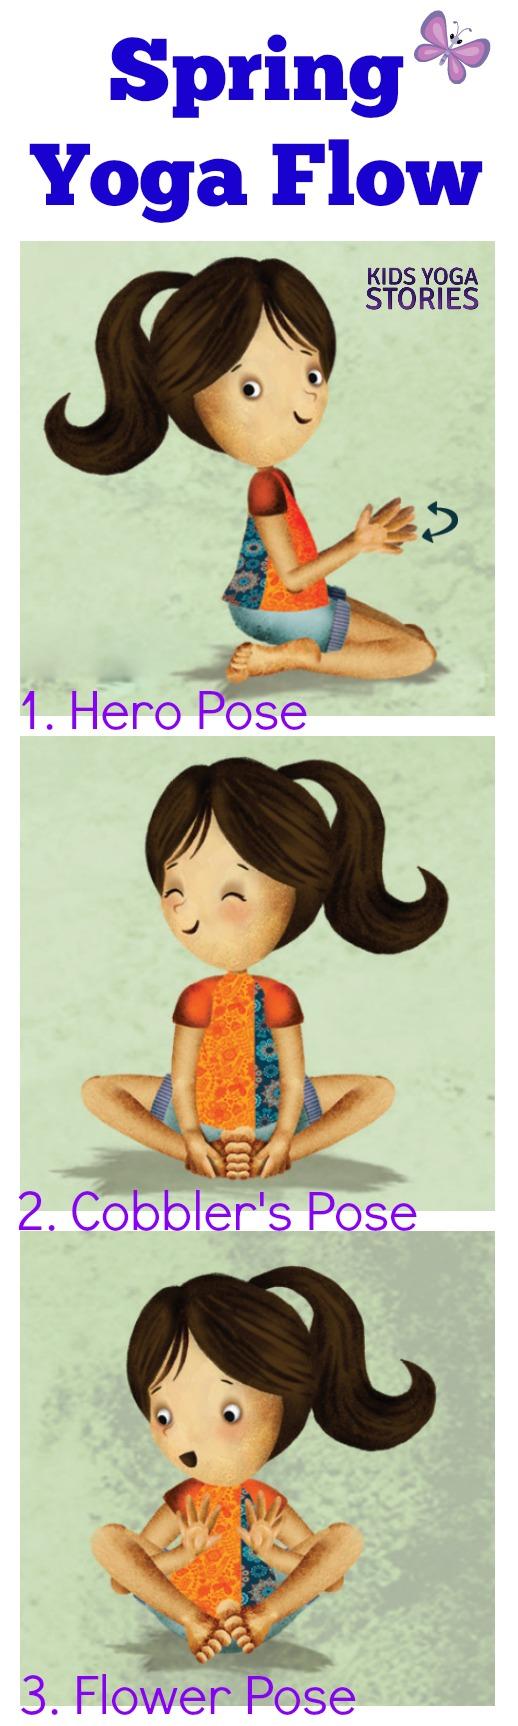 Spring 3-yoga pose flow   Kids Yoga Stories